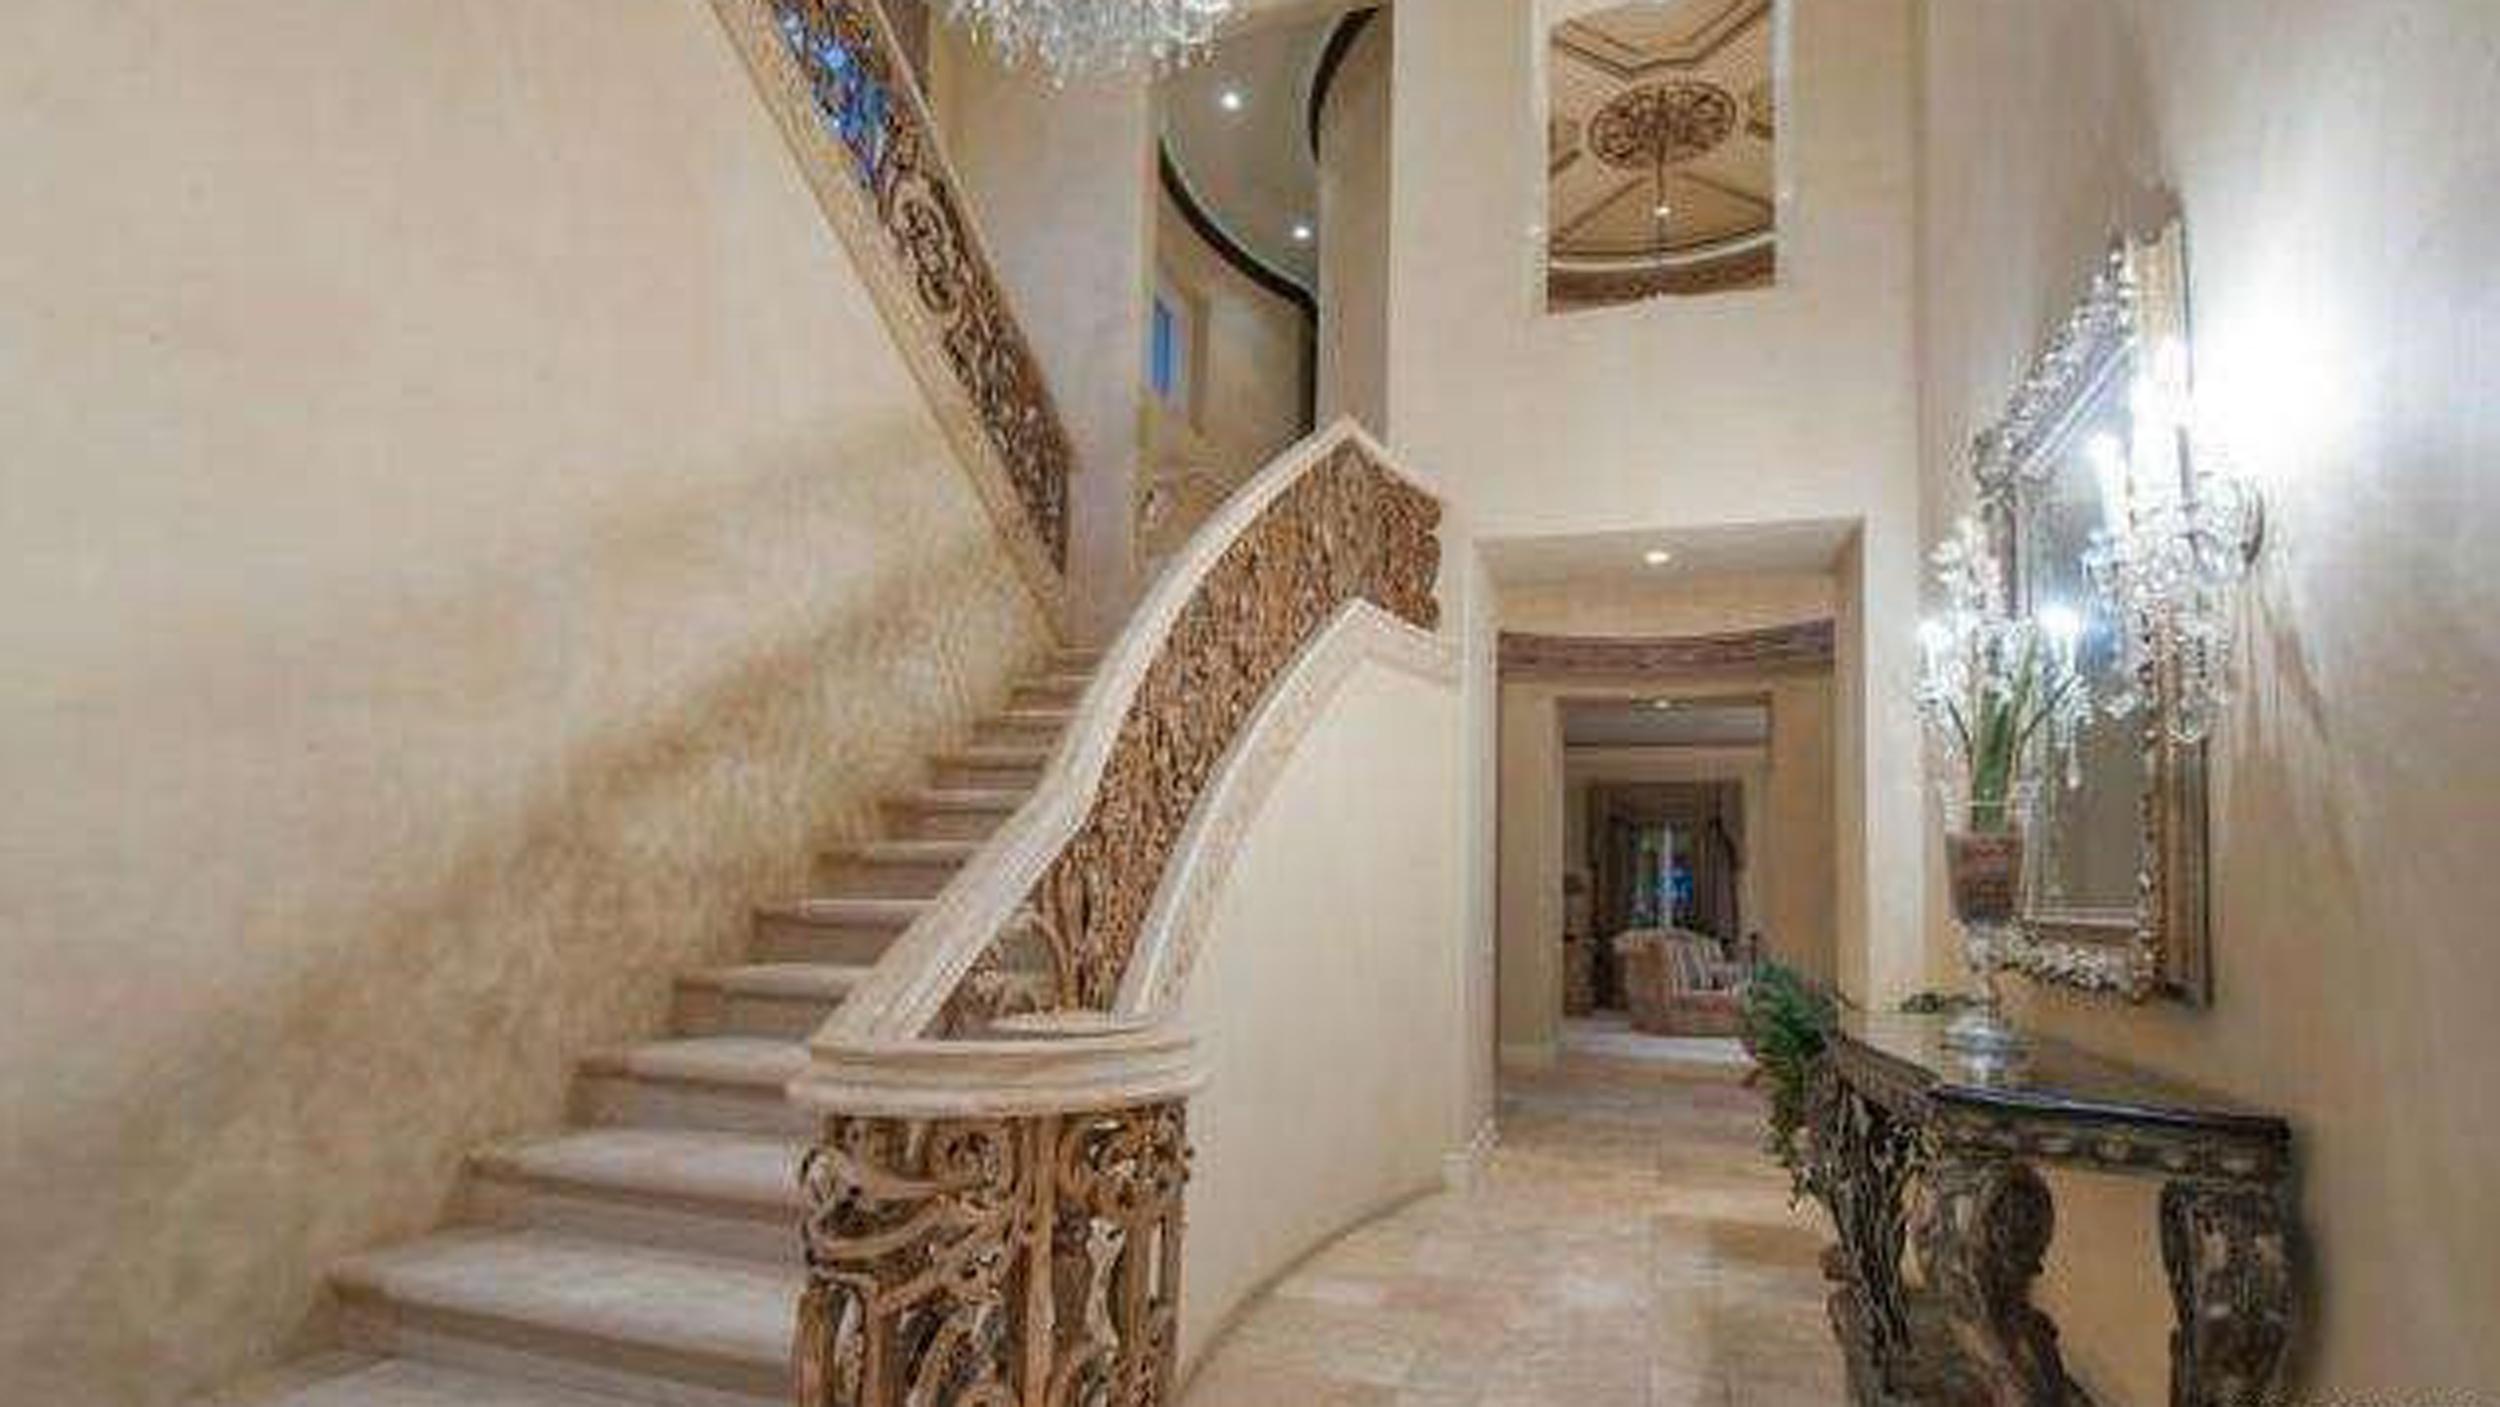 Fantastic Kobe Bryant Drops Mansion Price By Million Kobe Bryant House Pacific Palisades Kobe Bryant House Coto De Caza curbed Kobe Bryant House